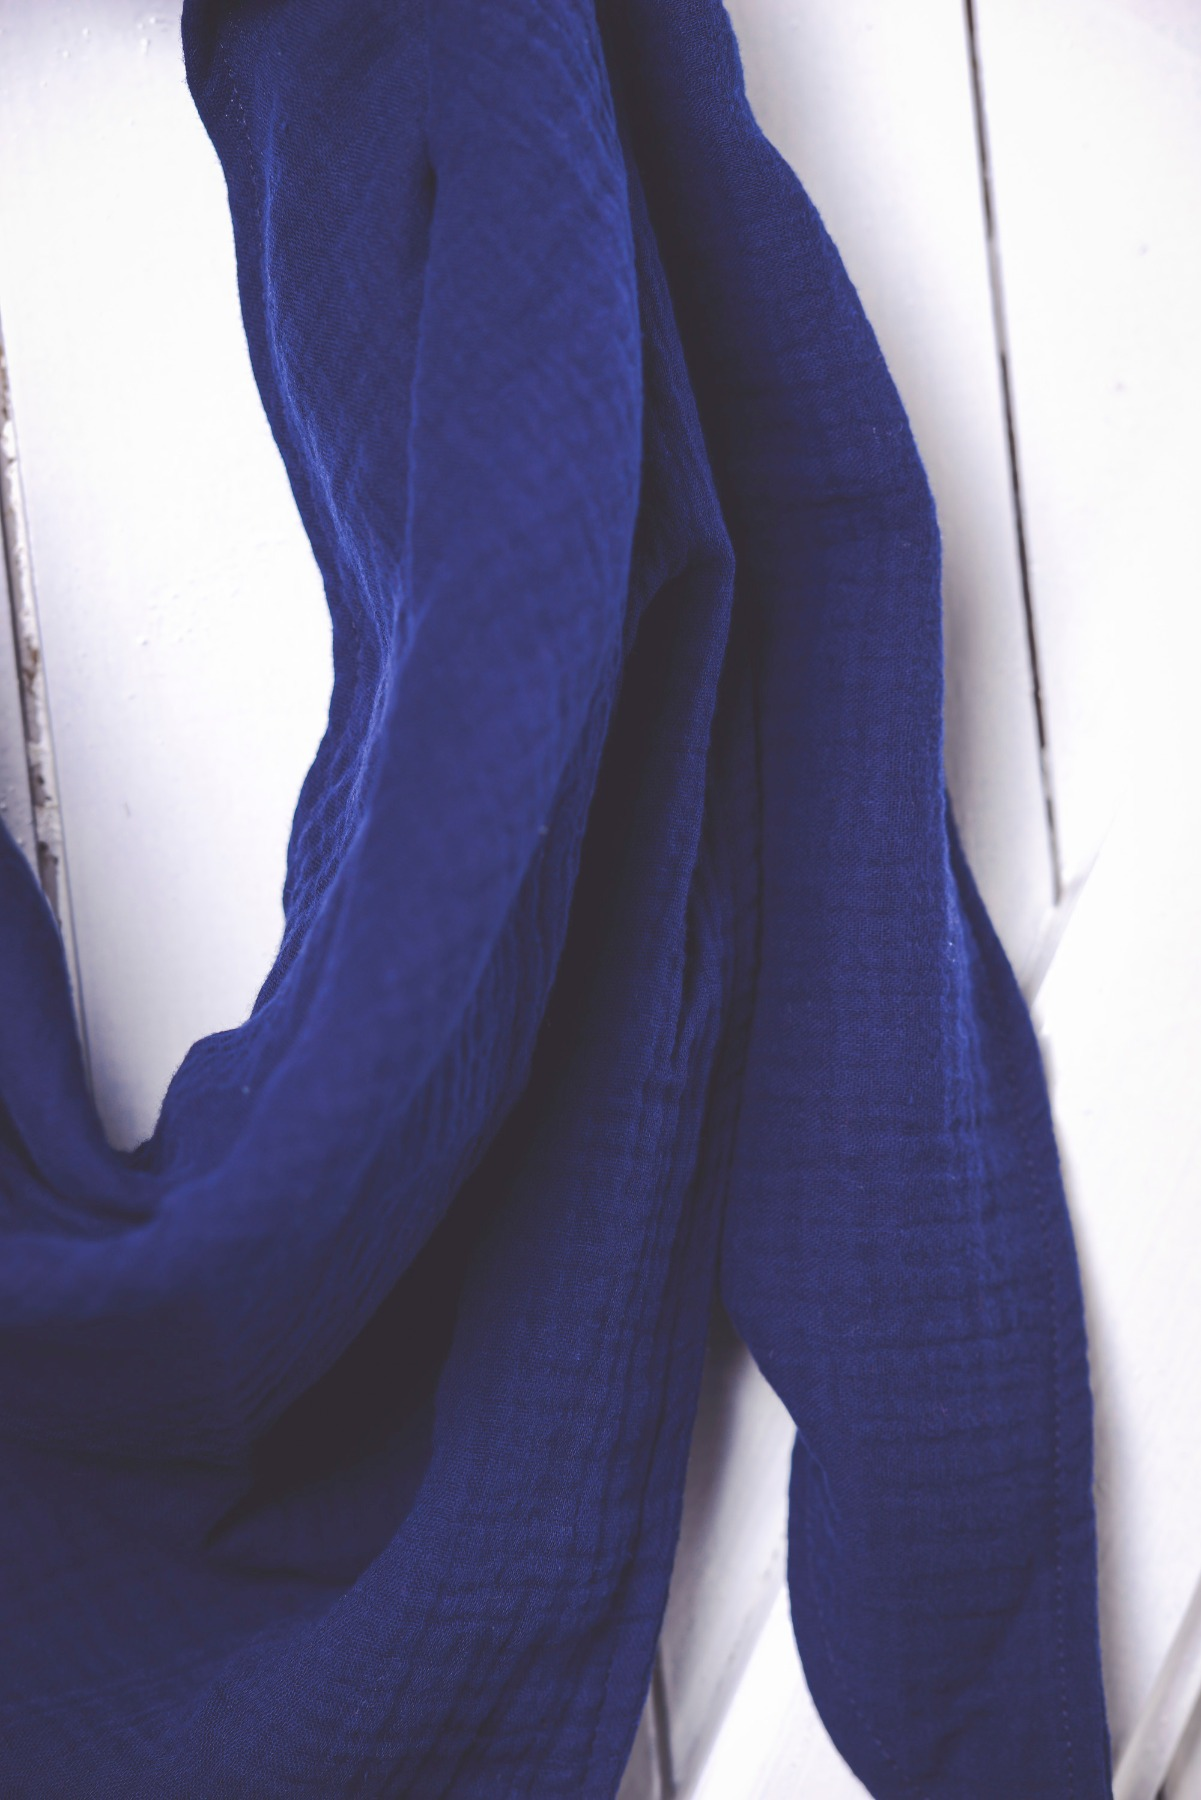 großes einfarbiges XL- Musselintuch einfarbig dunkleblau